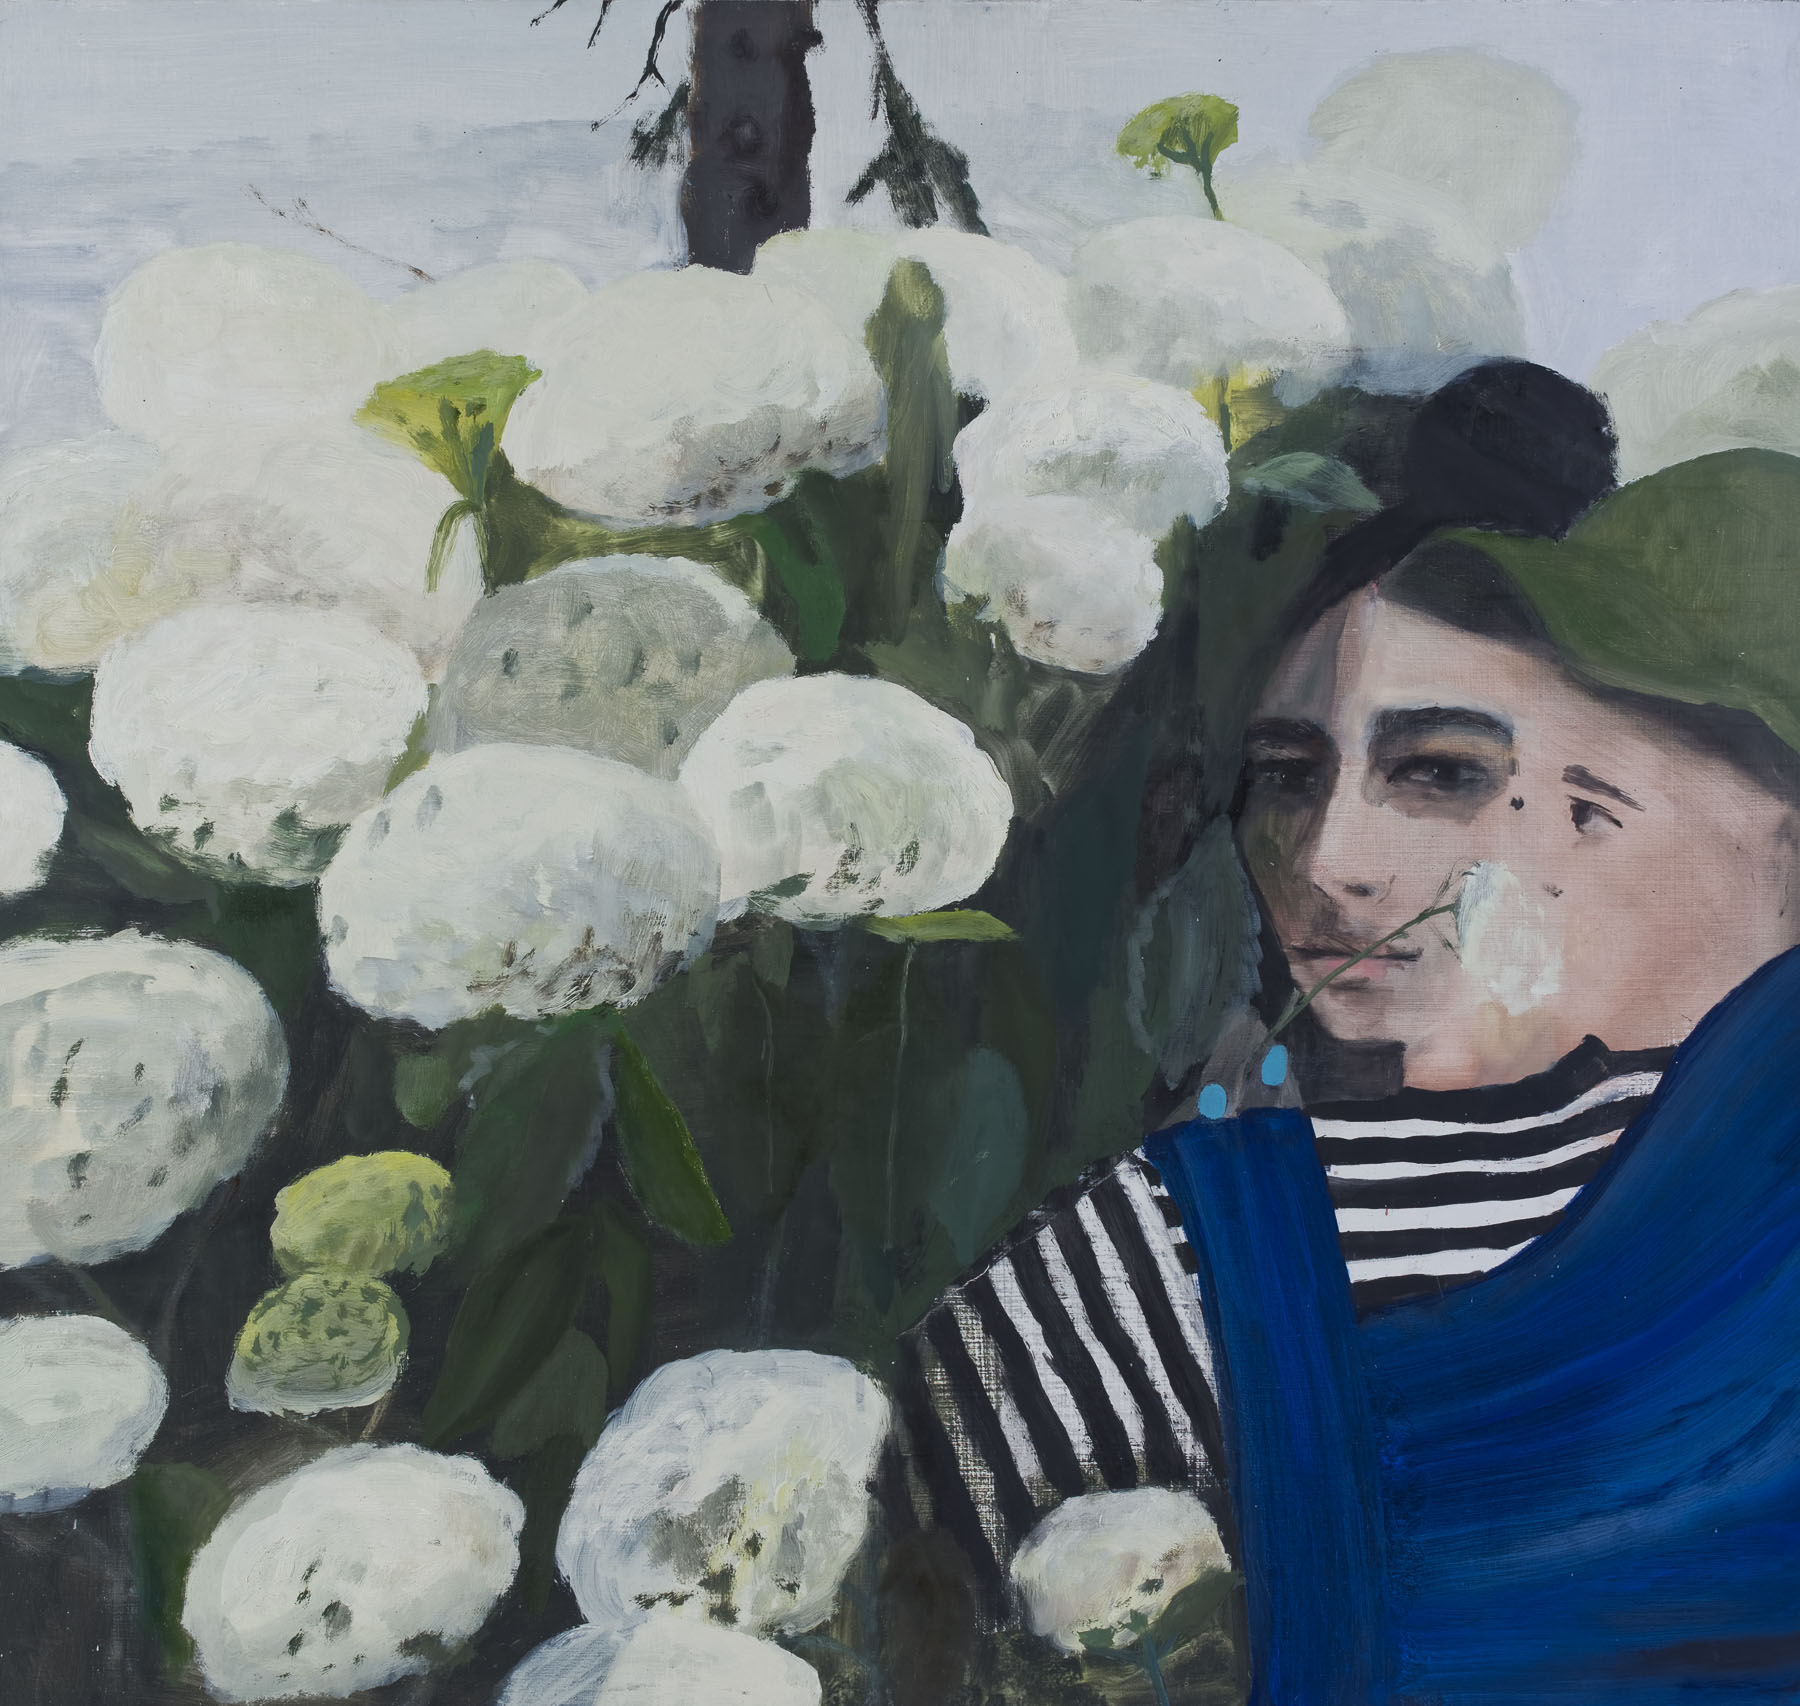 Aubrey Levinthal - Aubrey LevinthalApril 18 - June 8, 2019